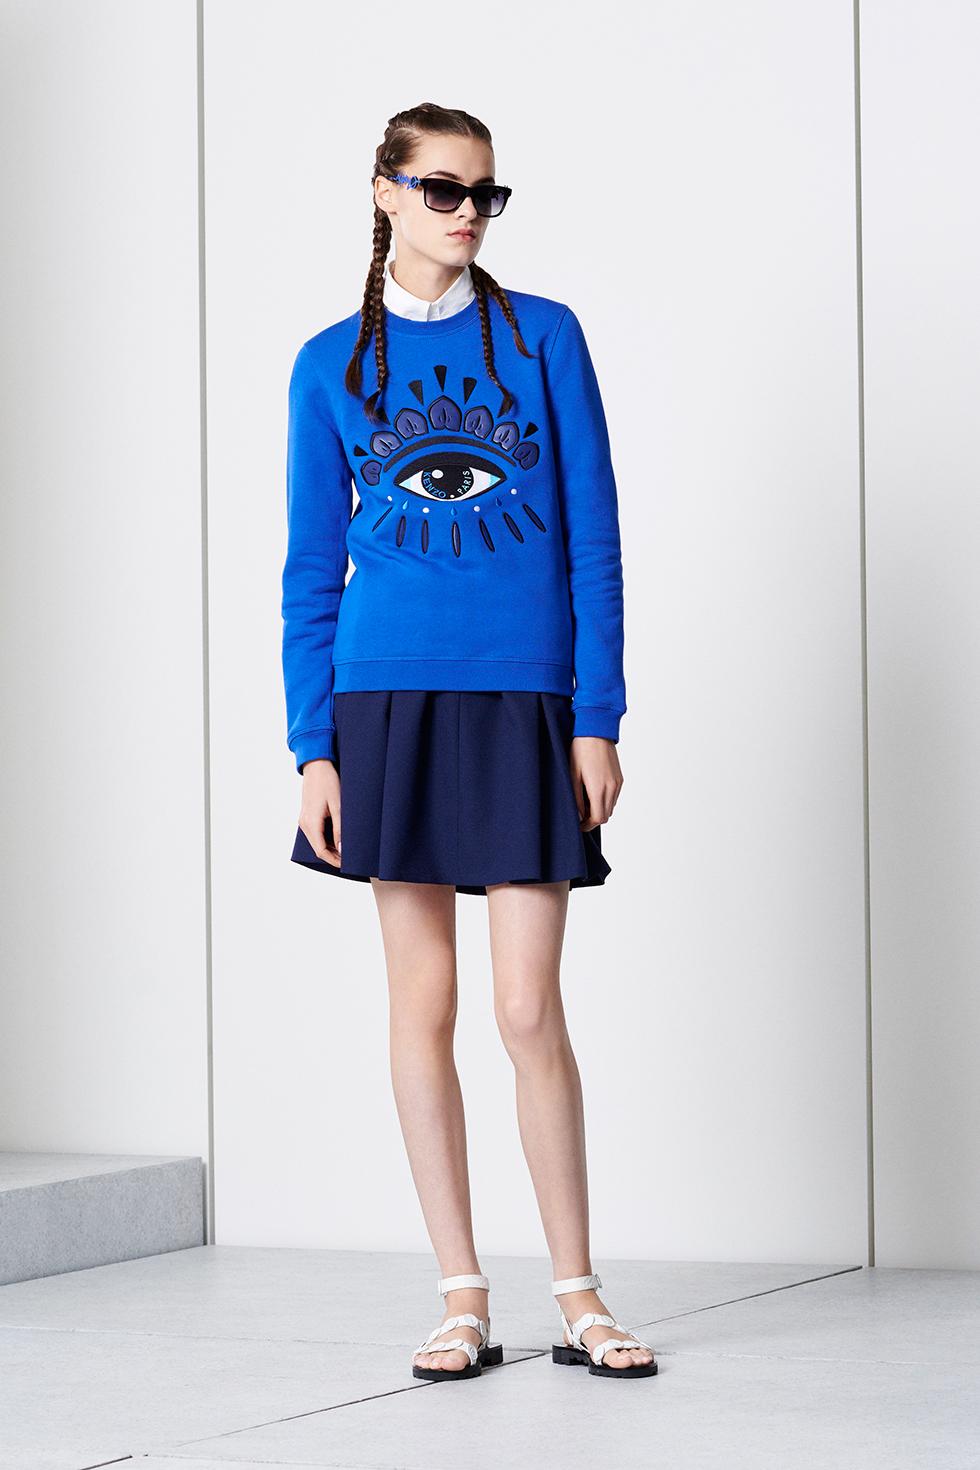 13d0b9c91b5 Kenzo Eye sweatshirt - Kenzo Sweatshirts & Sweaters Women - Kenzo E-shop